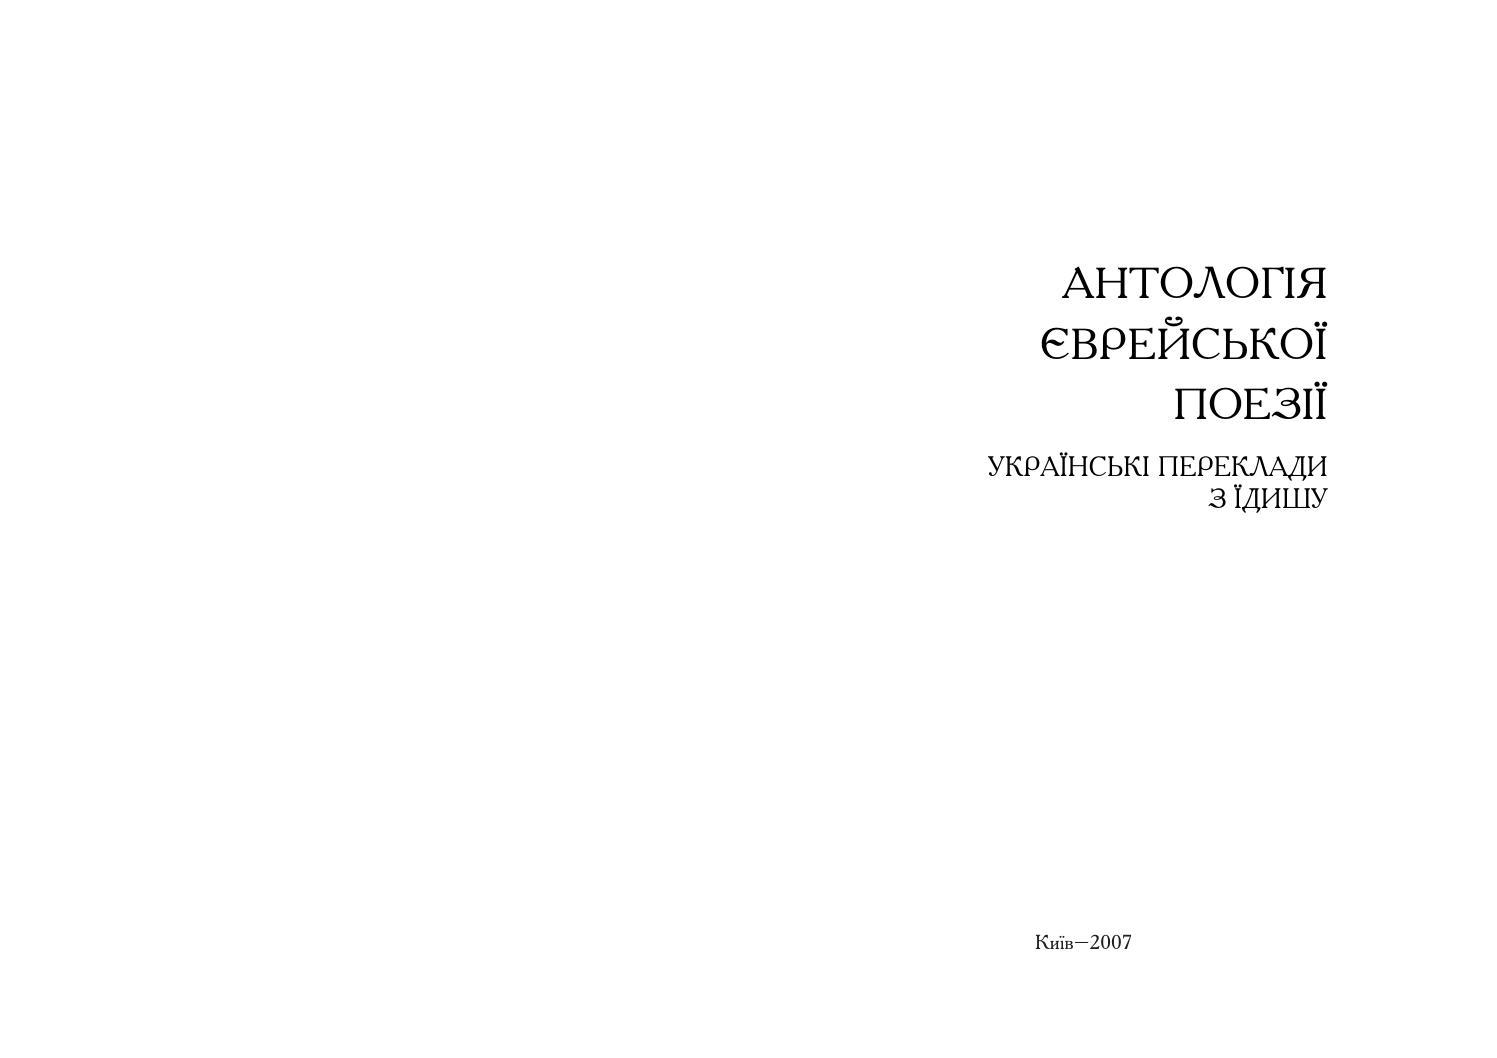 Антологія єврейської поезії by Judaica Center - issuu 2676d067d76eb